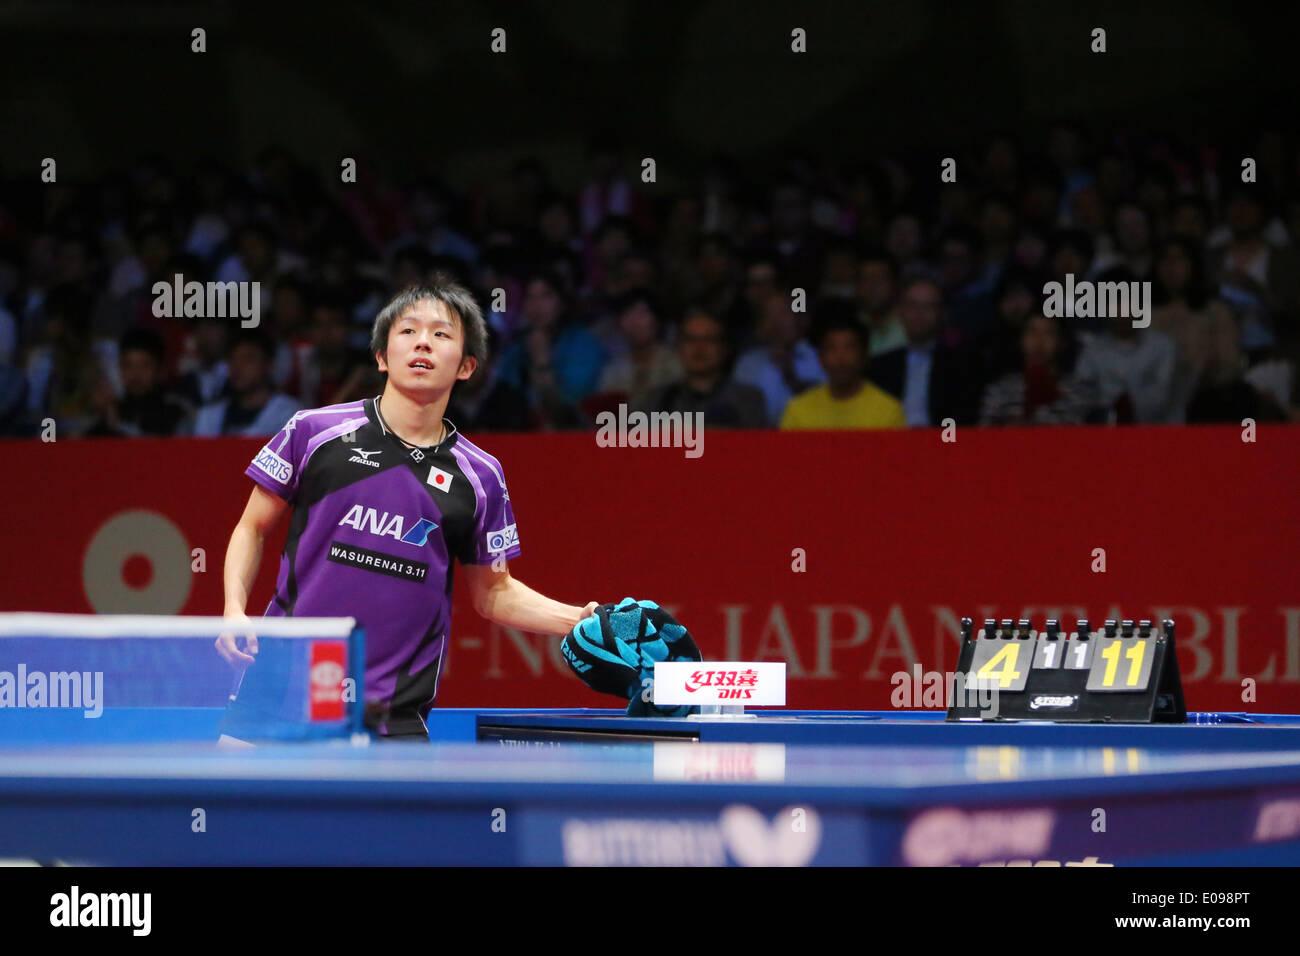 Koki Niwa (JPN), MAY 4, 2014 - Table Tennis : 2014 World Team Table Tennis Championships Men's semi final match between Germany 3-1 Japan at 1st Yoyogi Gymnasium, Tokyo, Japan. (Photo by Yusuke Nakanishi/AFLO SPORT) - Stock Image